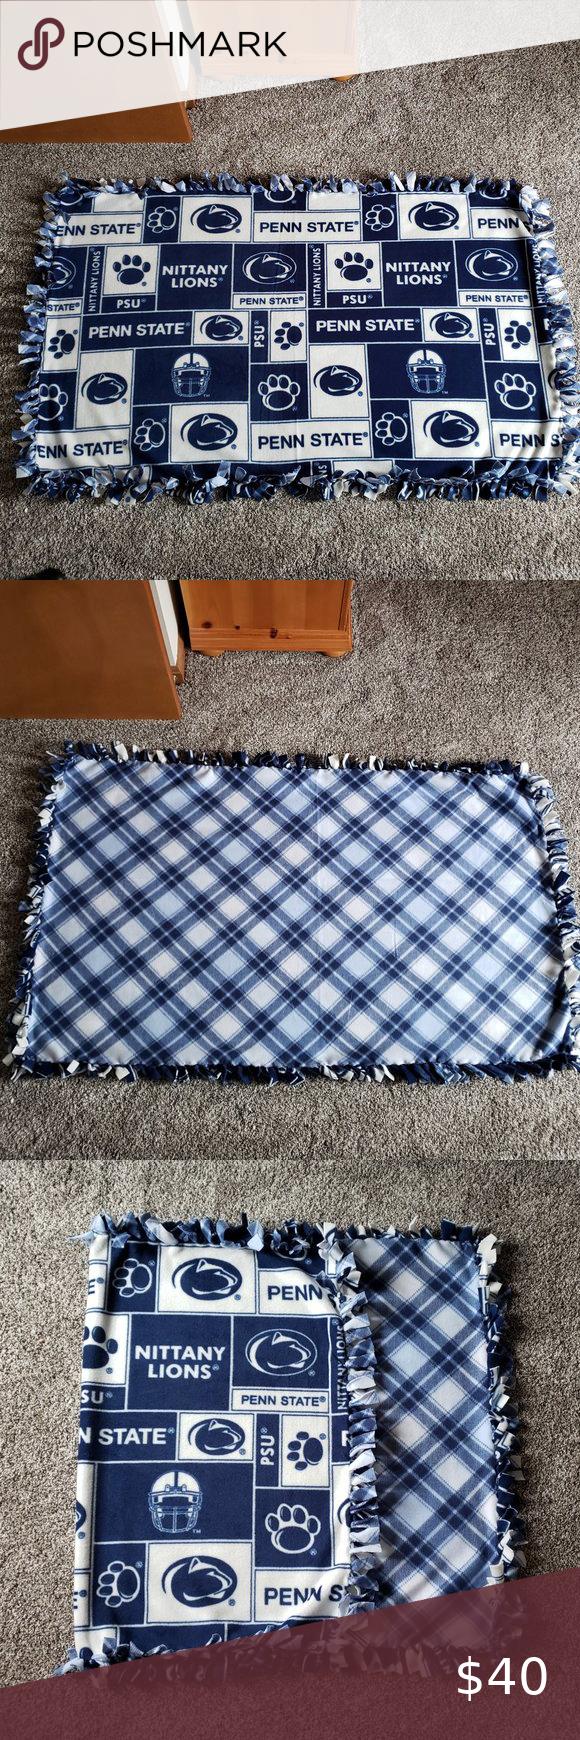 Penn State University No Sew Fleece Blanket No Sew Fleece Blanket Homemade Blankets Sewing Fleece